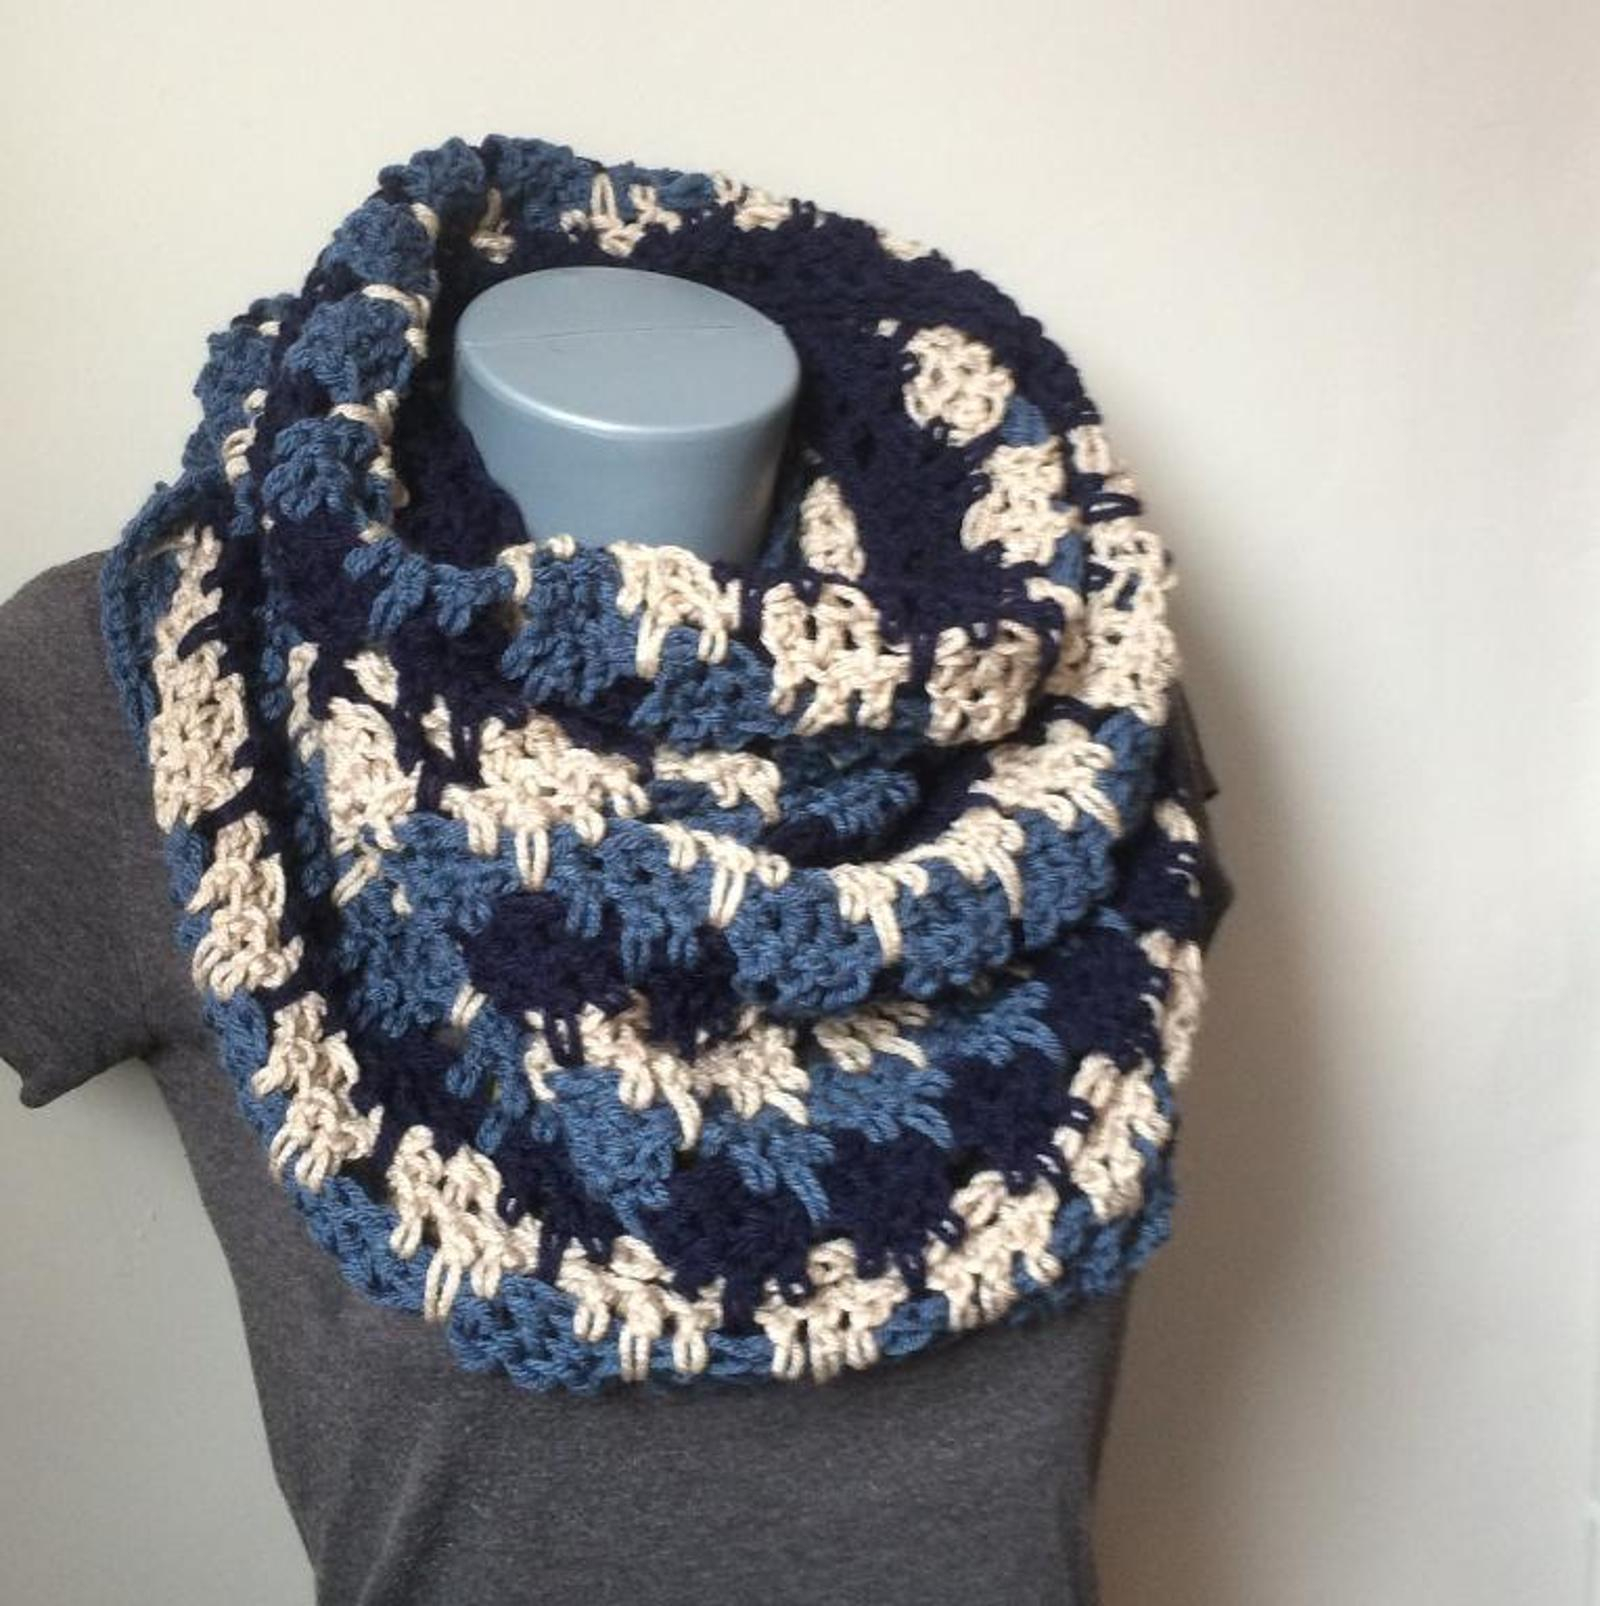 Free Infinity Scarf Crochet Pattern  5 Fab Free Crochet Infinity Scarf Patterns